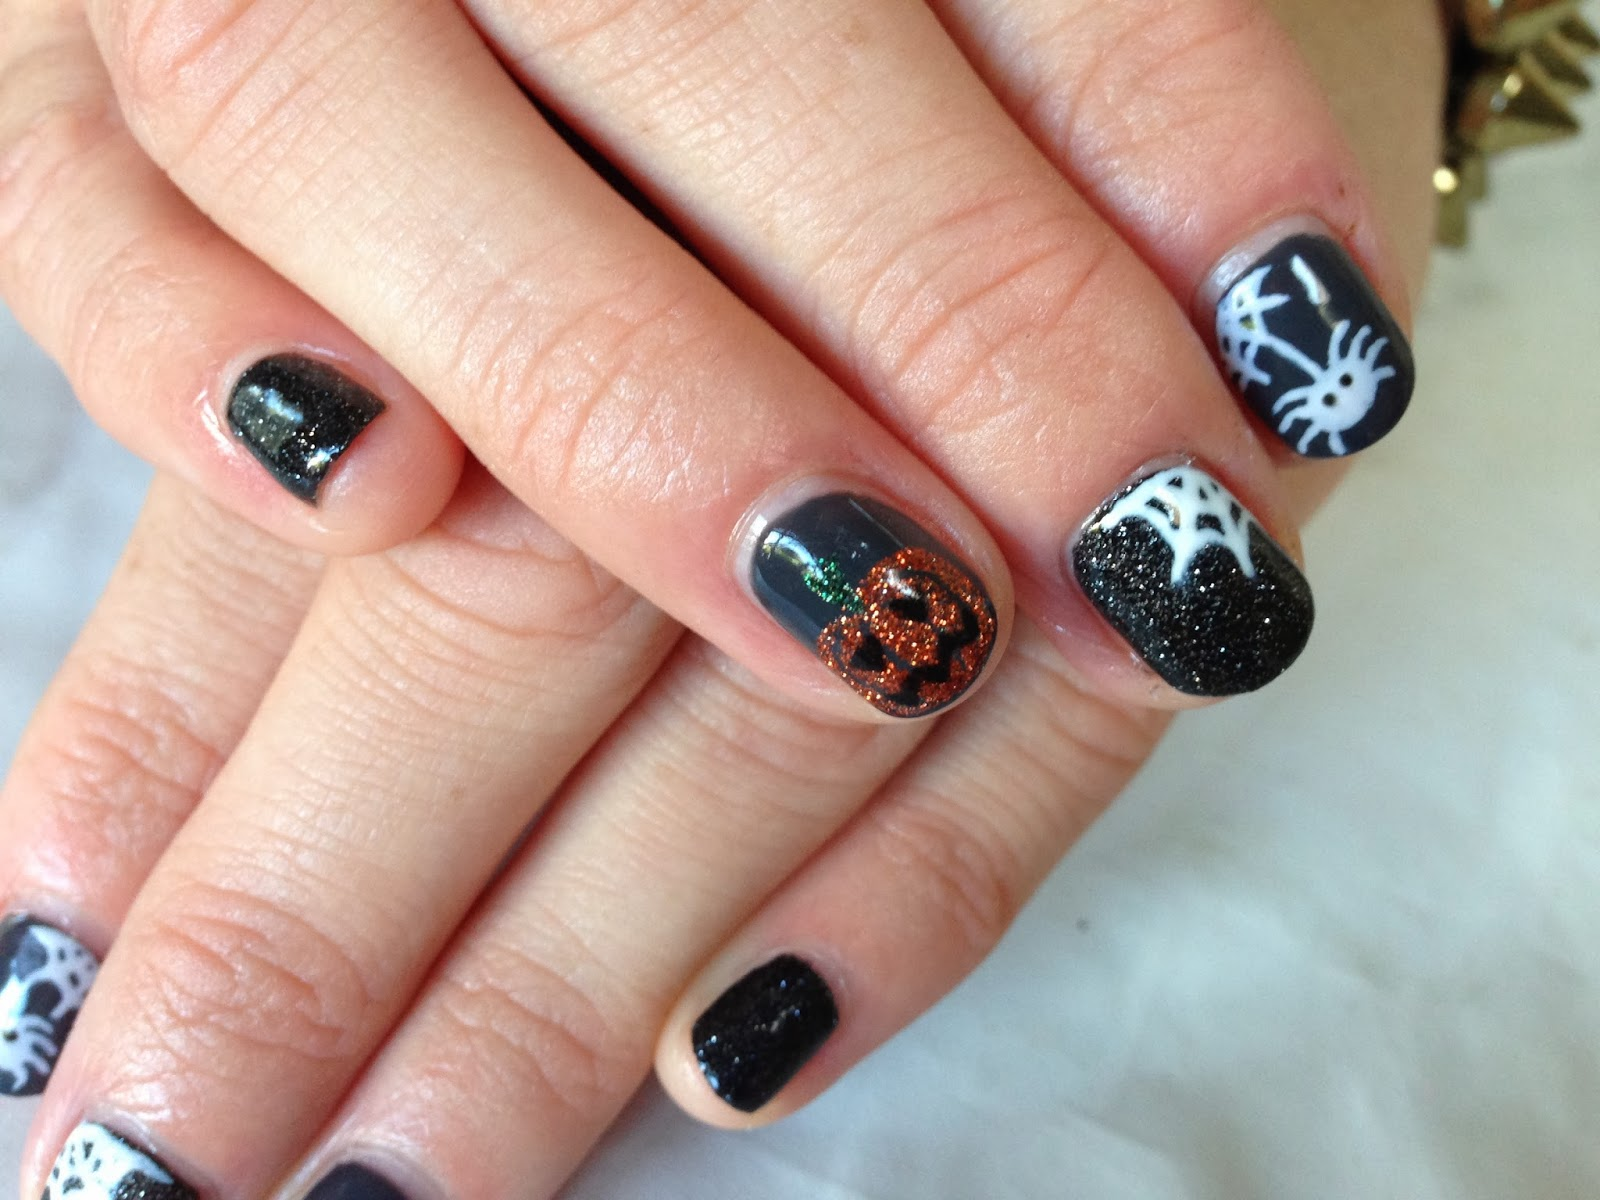 Brush up and Polish up!: CND Shellac Nail Art - Halloween Mix